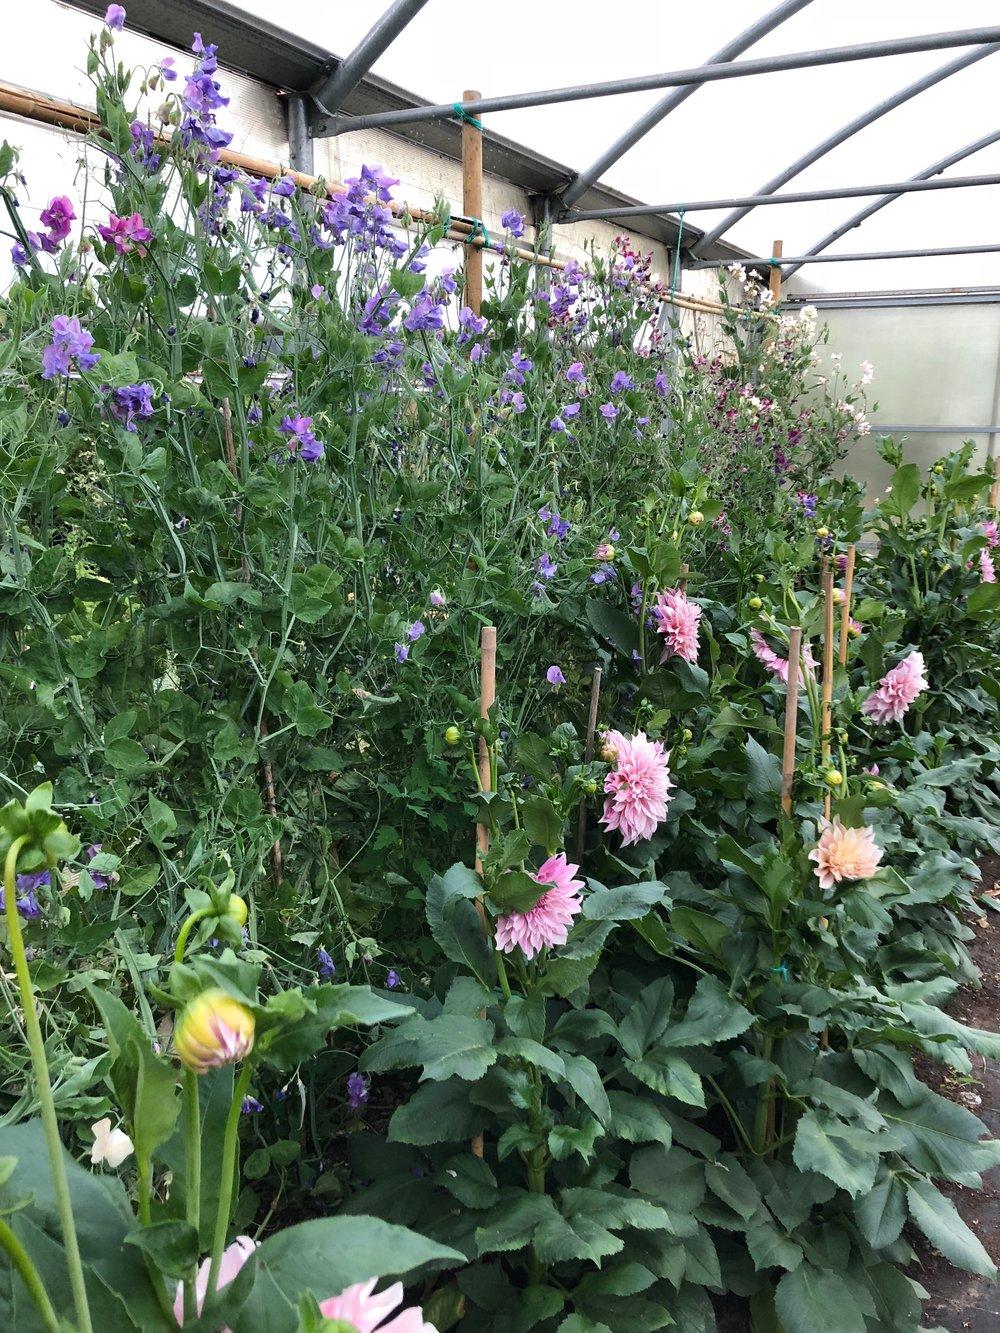 Sweet pea vines and dinner plate dahlias at Olga's Flower Farm